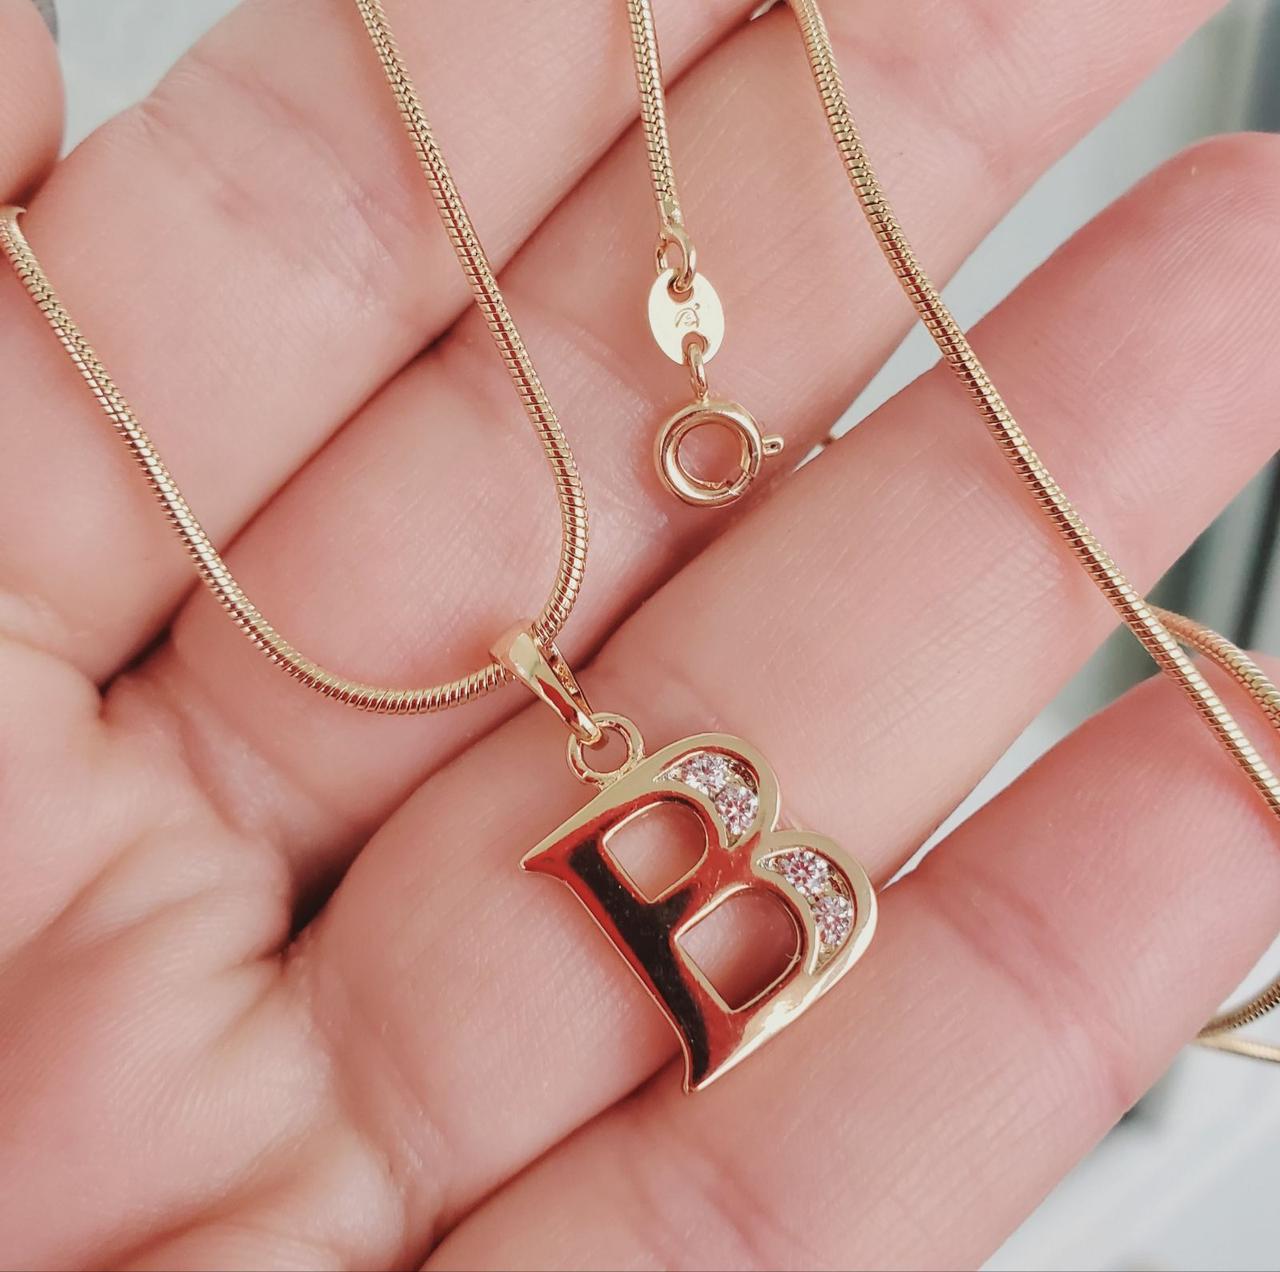 Кулон буква В с цепочкой снейк 1мм 50см xuping медицинское золото позолота 18К  5282